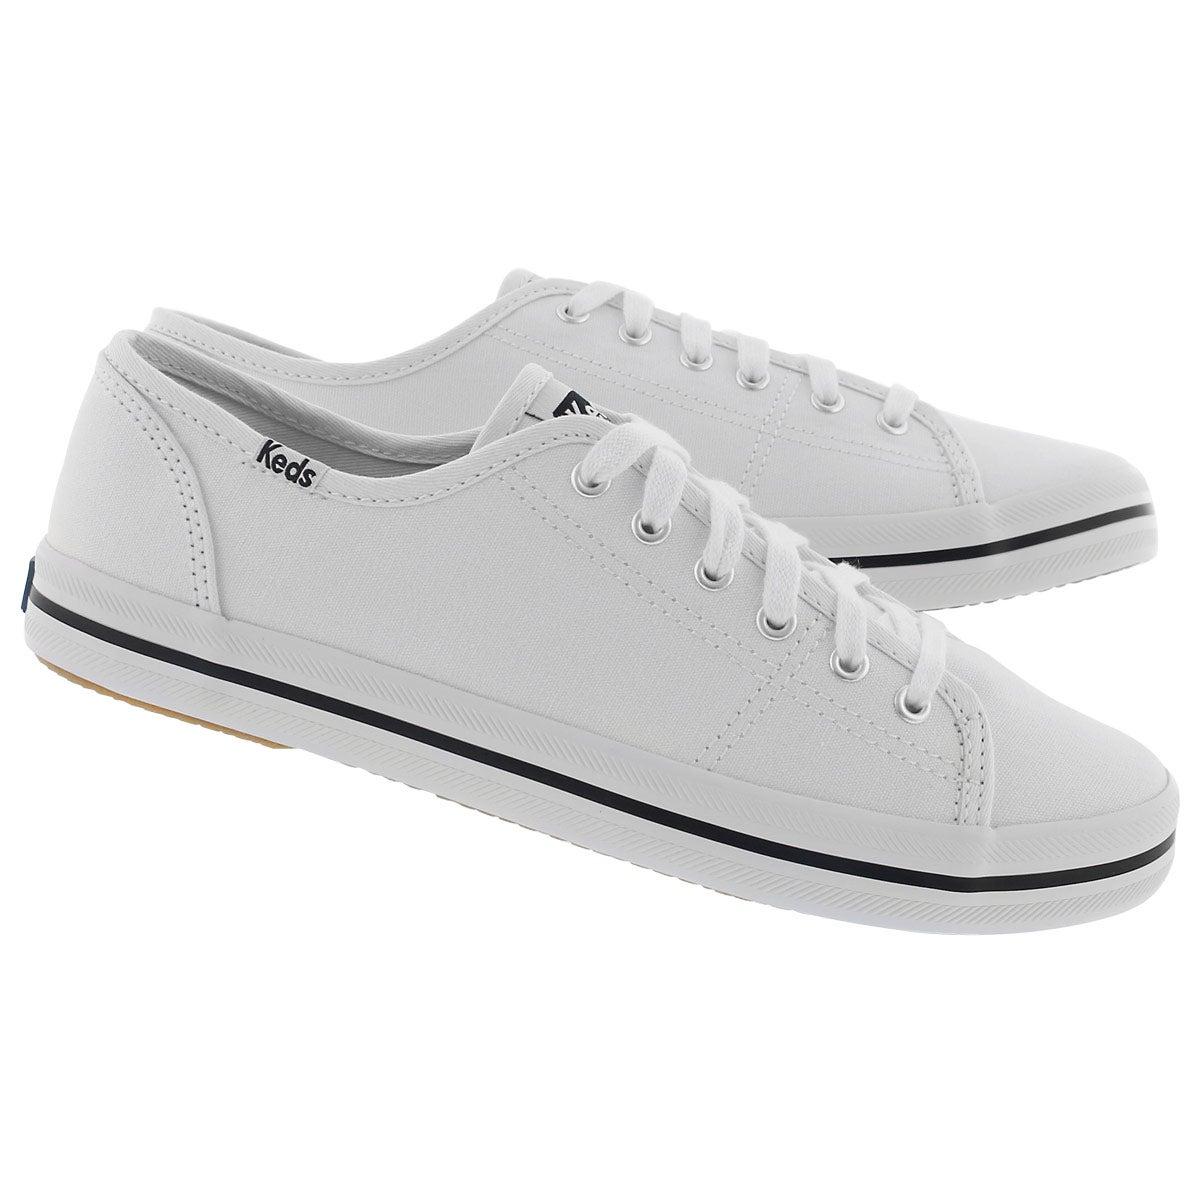 Lds Kickstart white canvas CVO sneaker